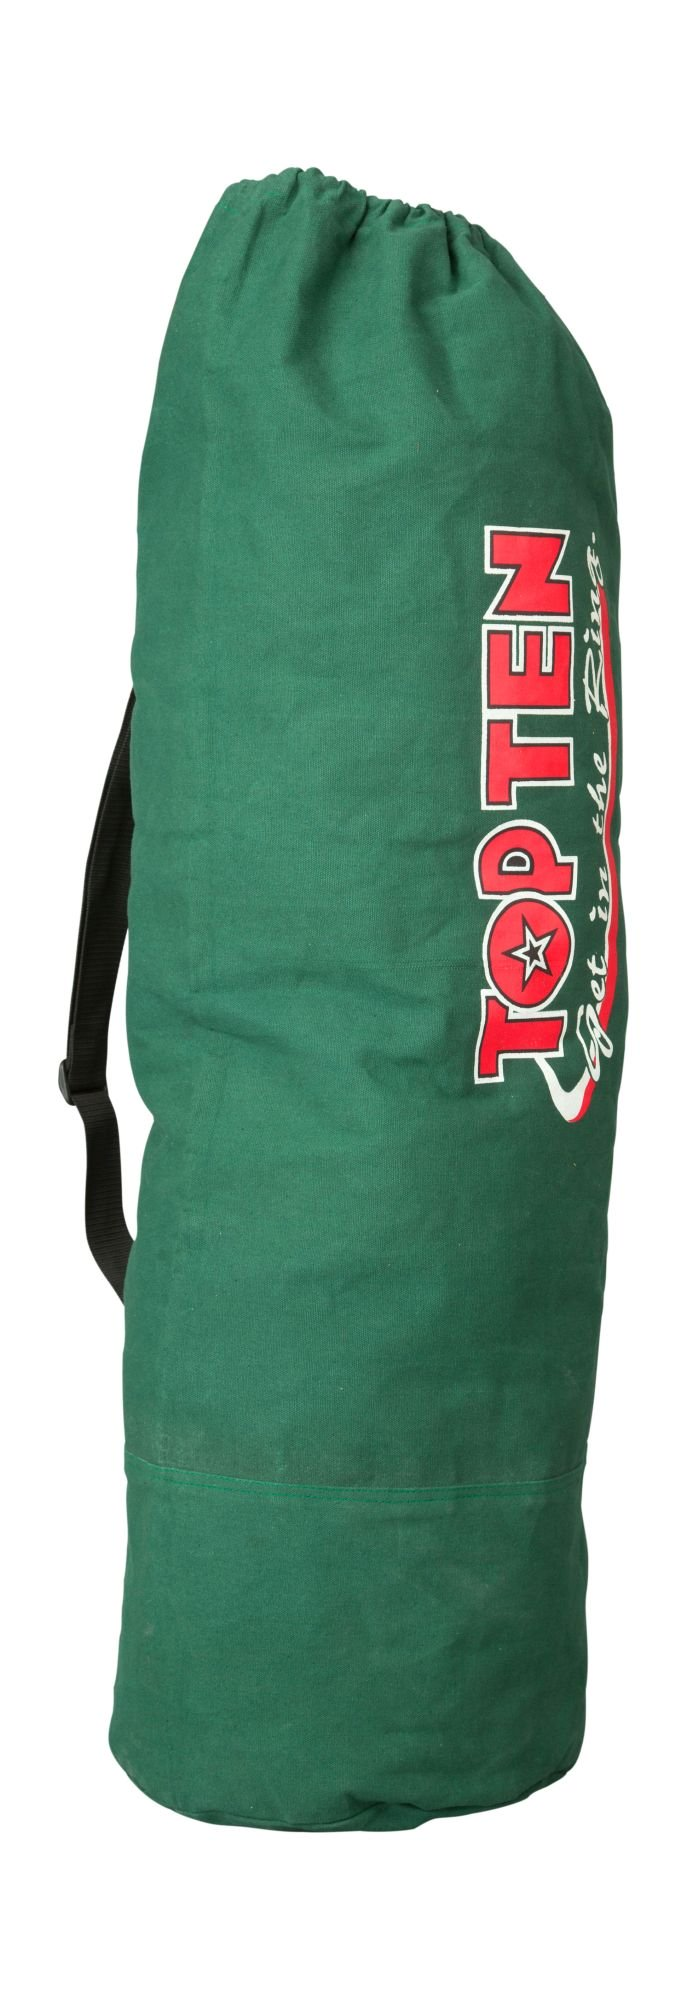 "Sailor's kit bag ""Get in the Ring"" DarkGroen"